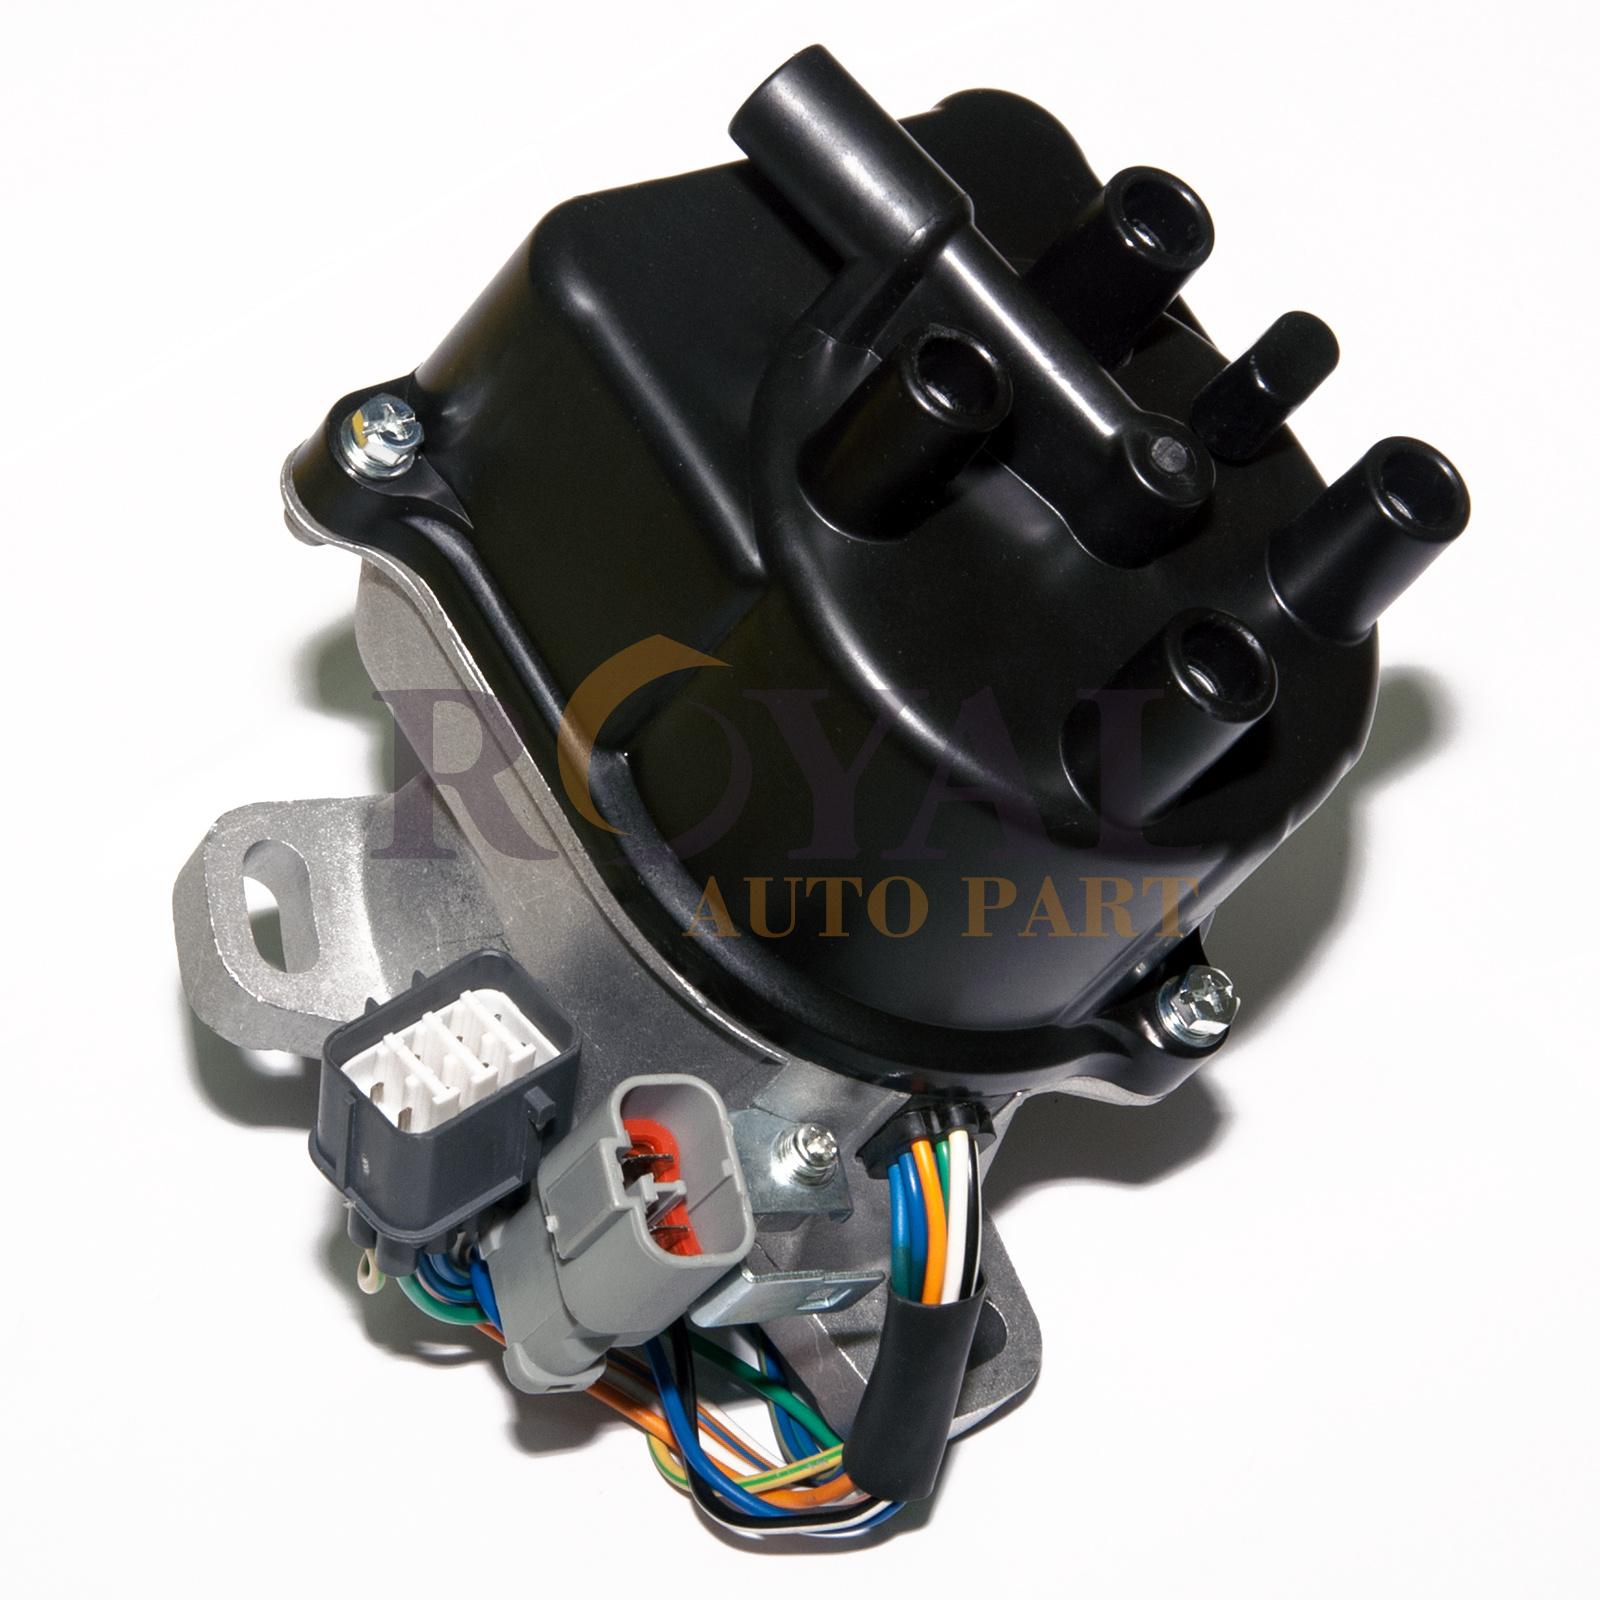 Td 52u Ignition Distributor 92 95 Honda Accord Prelude 22l External 1992 Coil Td59u